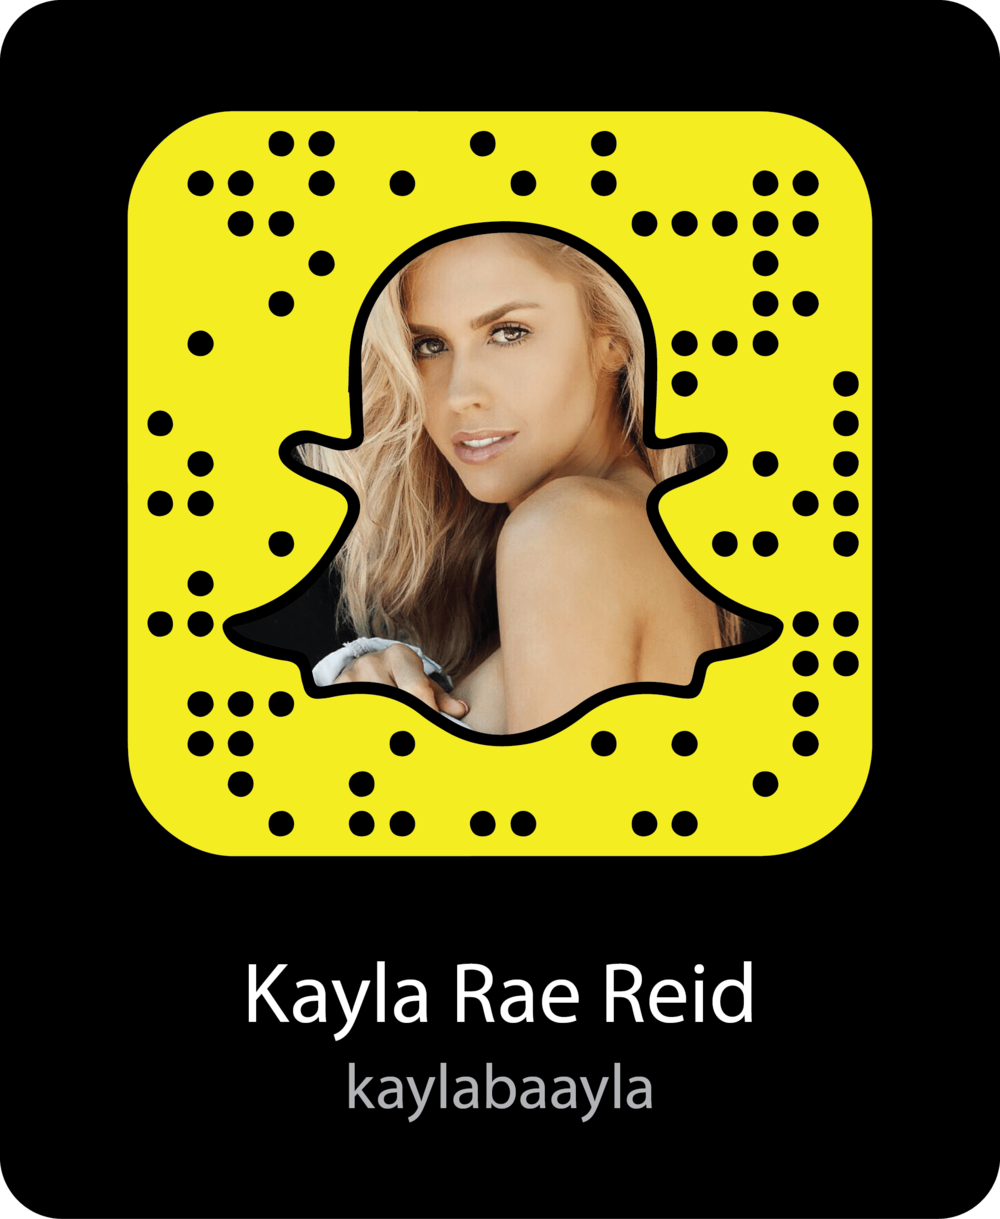 kayla-rae-reid-sexy-snapchat-snapcode